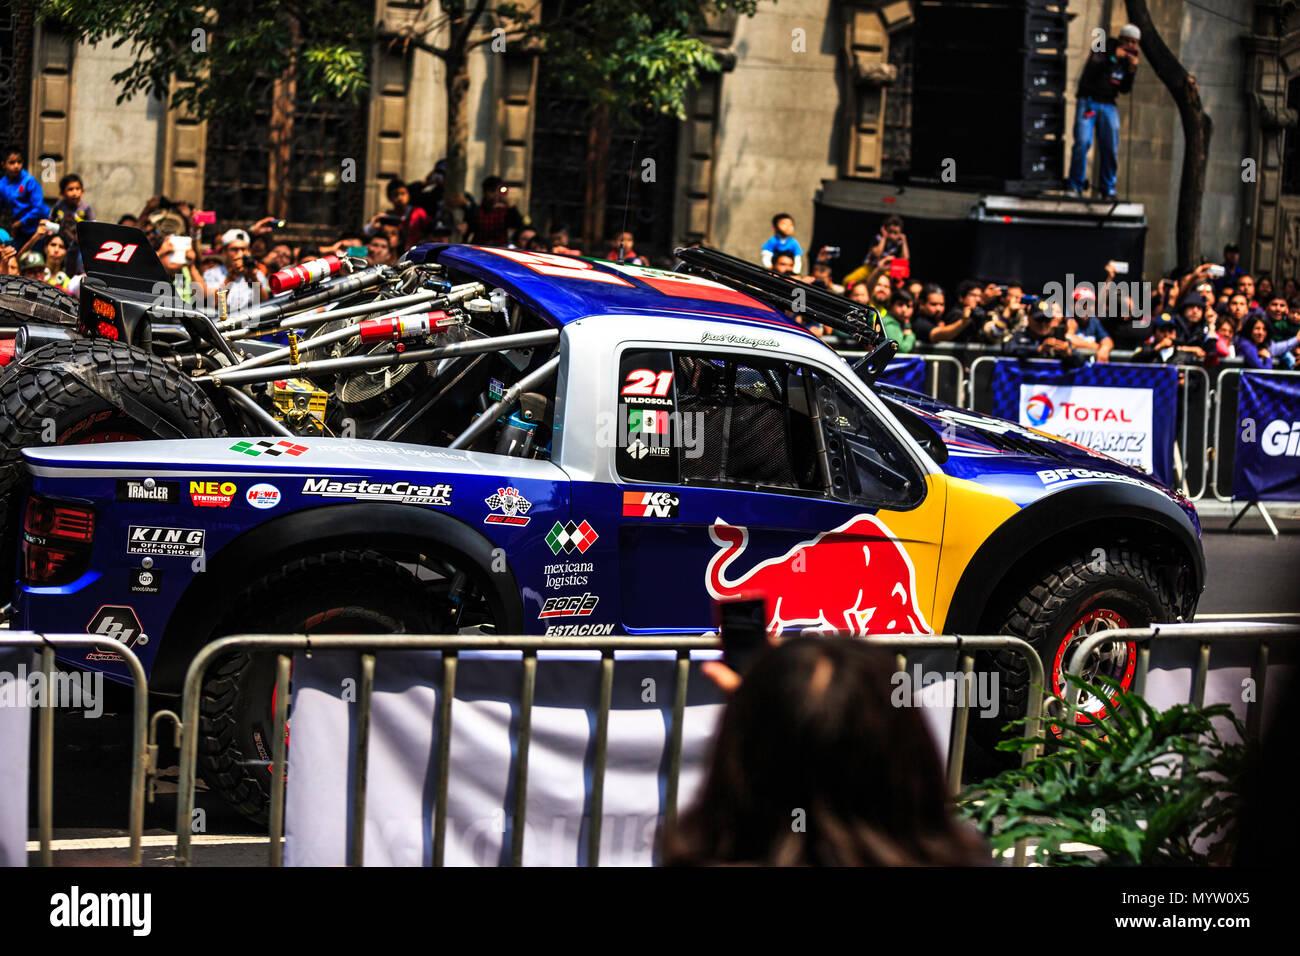 Mexico City, Mexico - June 27, 2015: Gustavo Vildosola driving around the Zocalo Square and 20 de Noviembre street, at the Infiniti Red Bull Racing F1 Showrun. - Stock Image